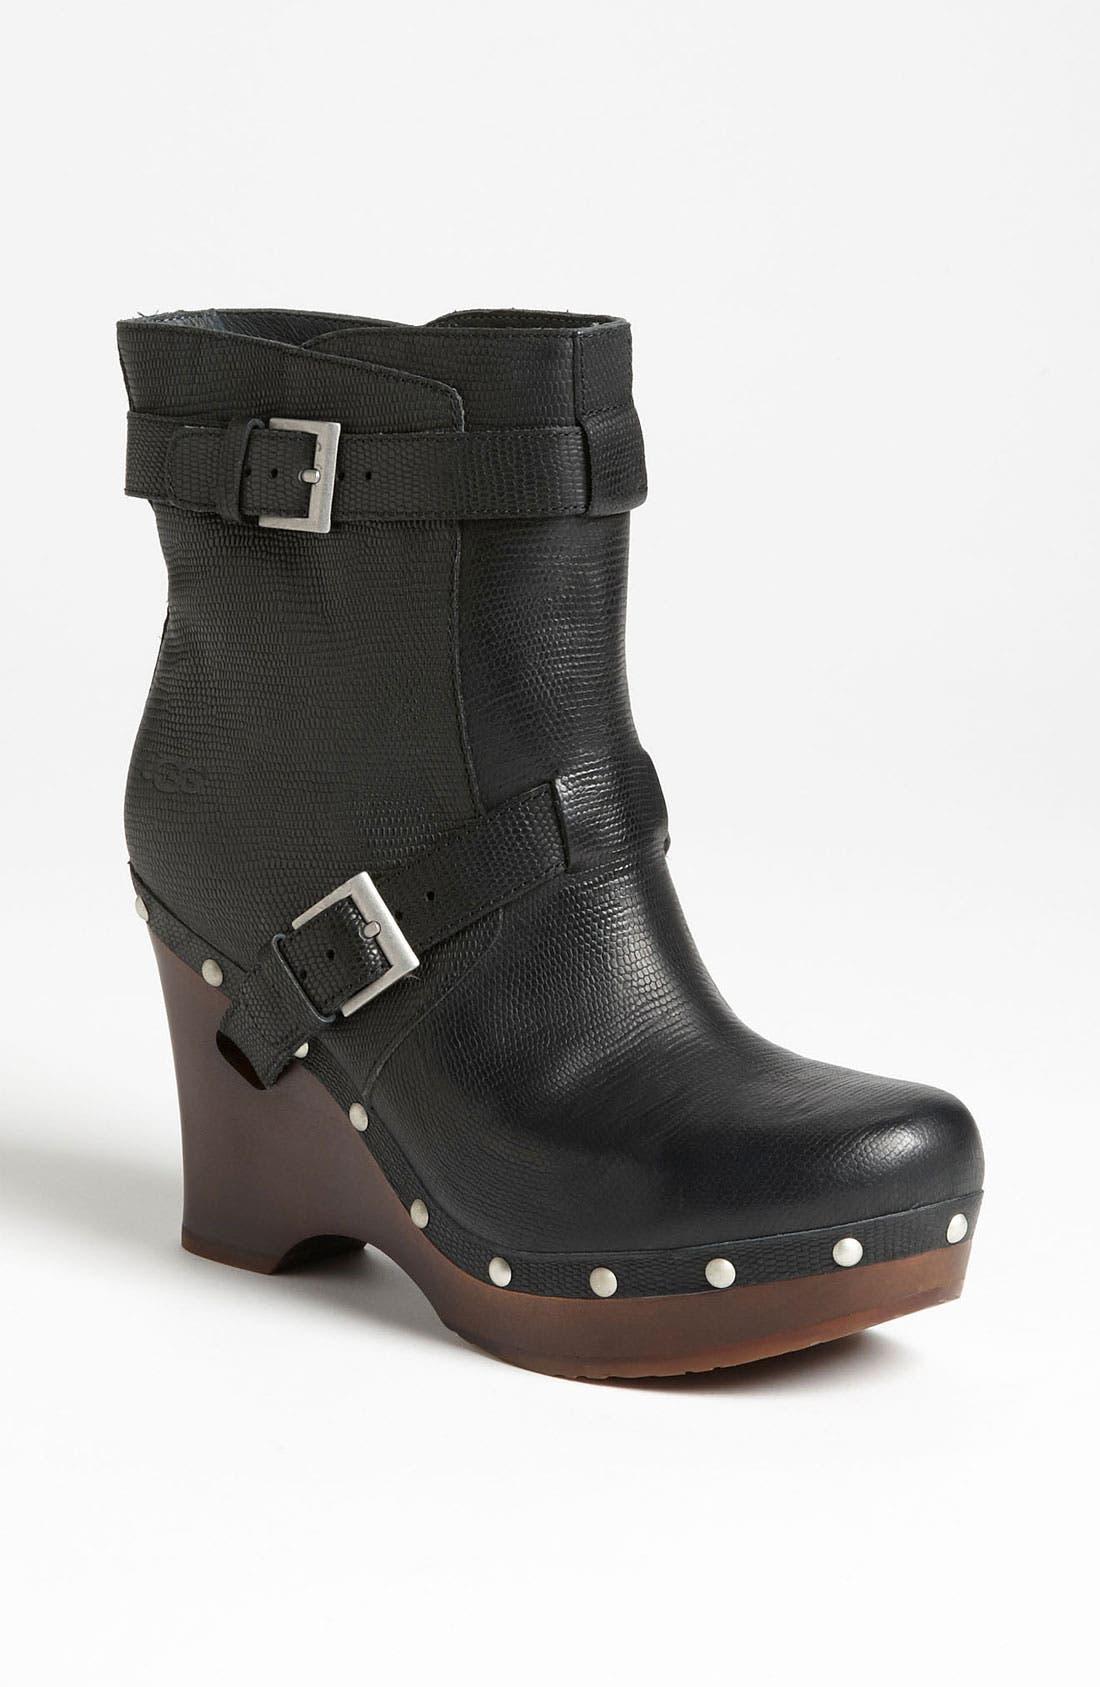 Alternate Image 1 Selected - UGG® Australia 'Taryn' Boot (Women)